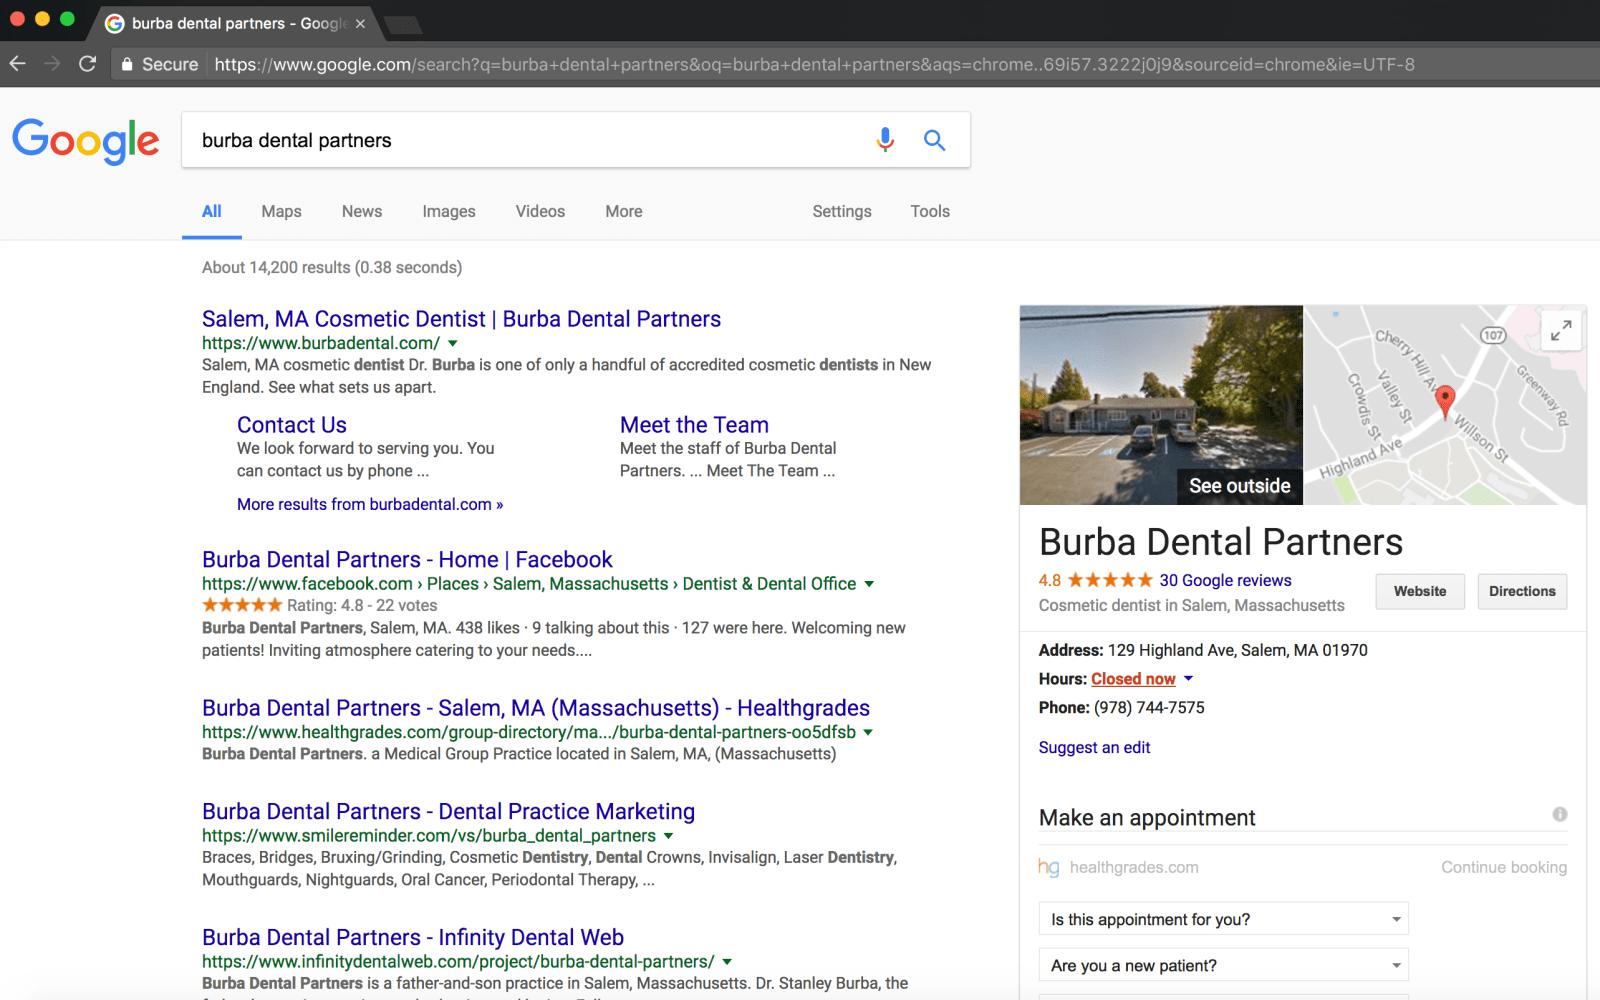 Burba Dental Partners Search Page